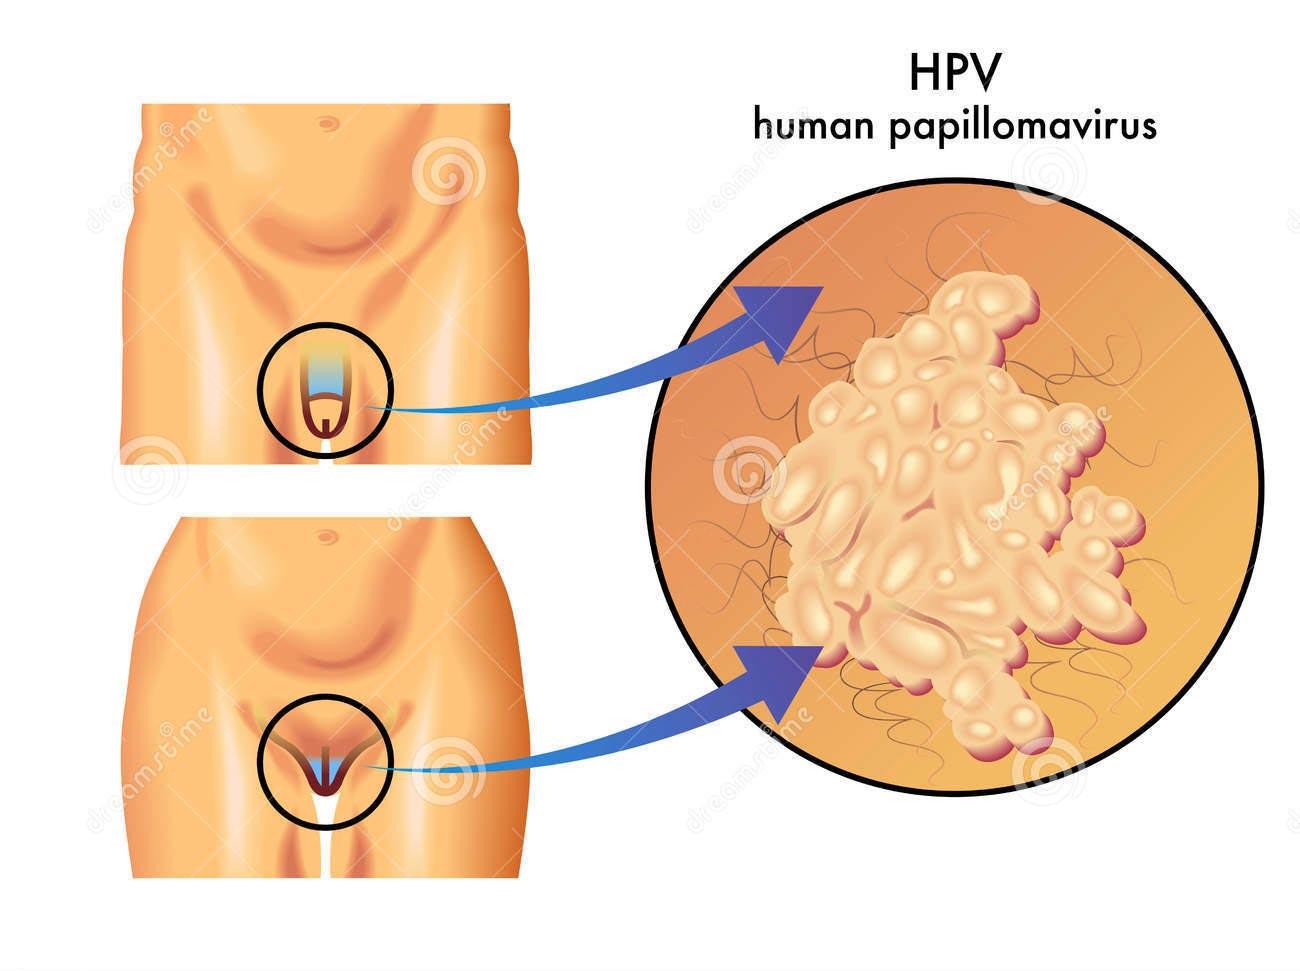 Papilloma virus sintomi nell uomo Hpv sintomi nelluomo